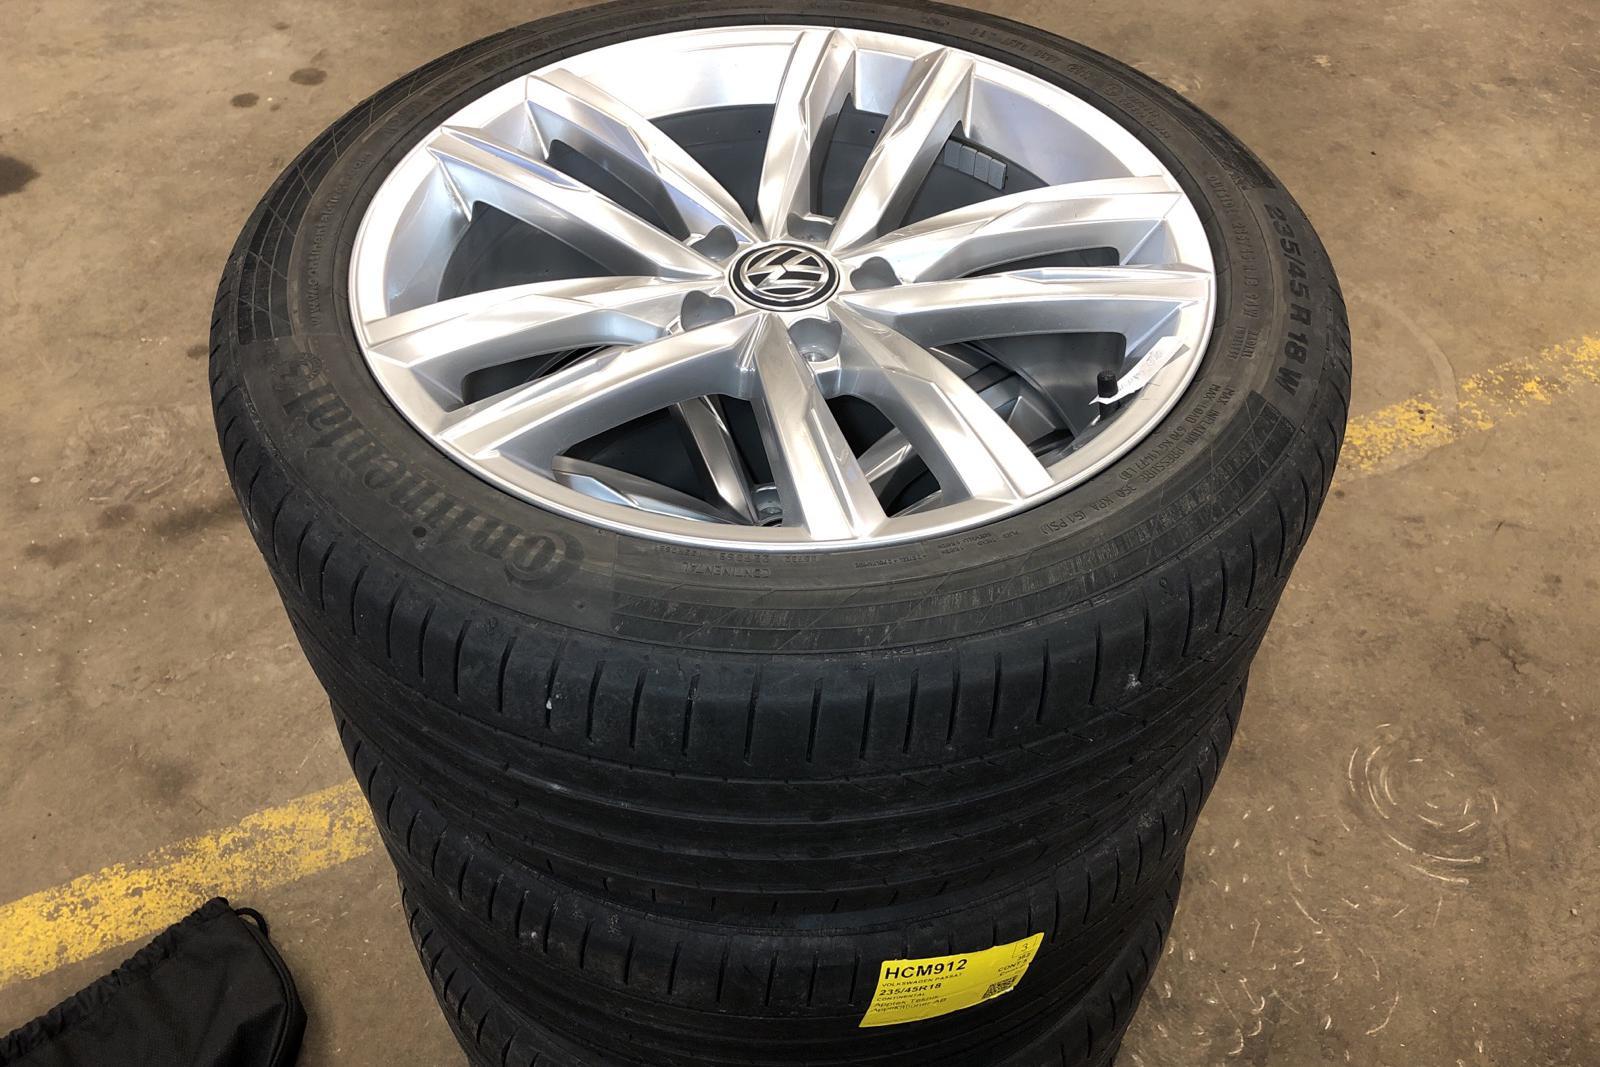 VW Passat 1.4 Plug-in-Hybrid Sportscombi (218hk) - 5 060 mil - Automat - blå - 2018